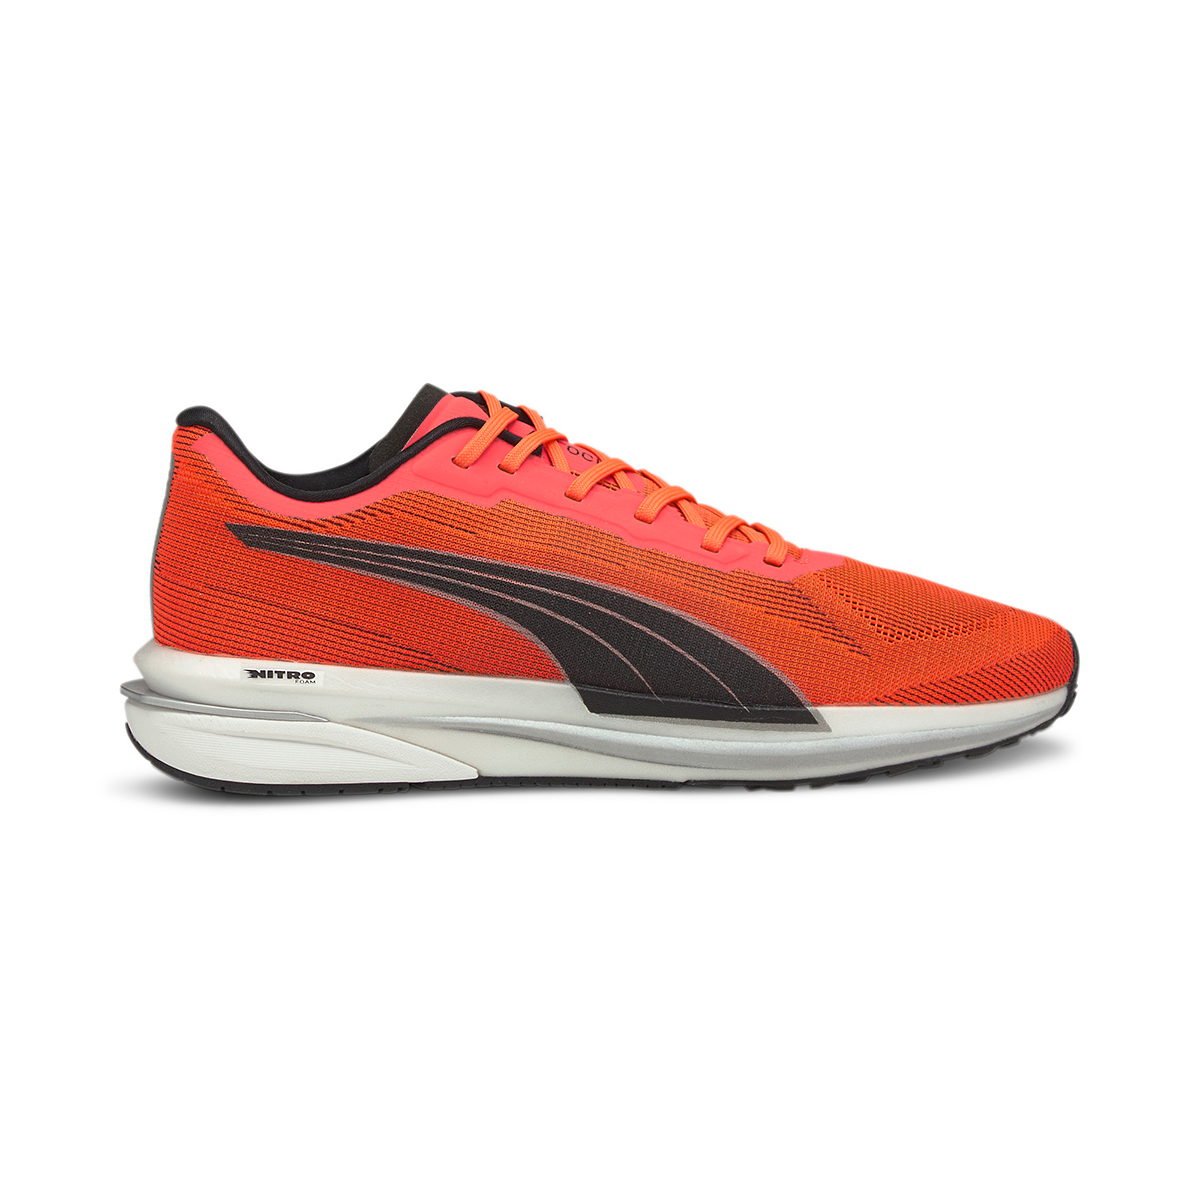 Women's Puma Velocity Nitro Running Shoe - Color: Lava Blast - Size: 5.5 - Width: Regular, Lava Blast, large, image 1